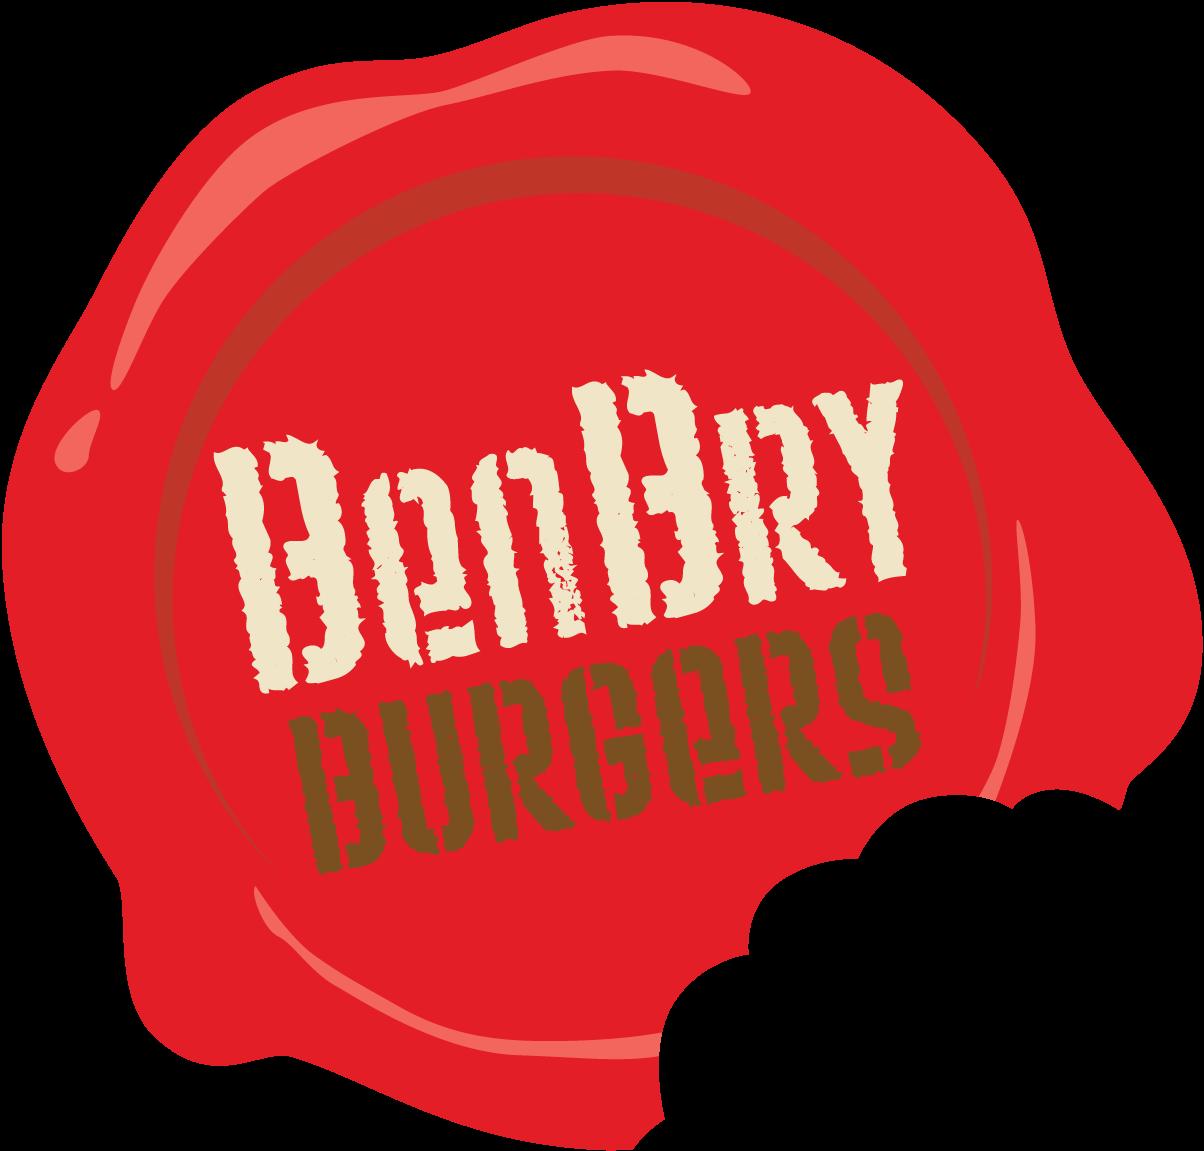 BenBry Burgers